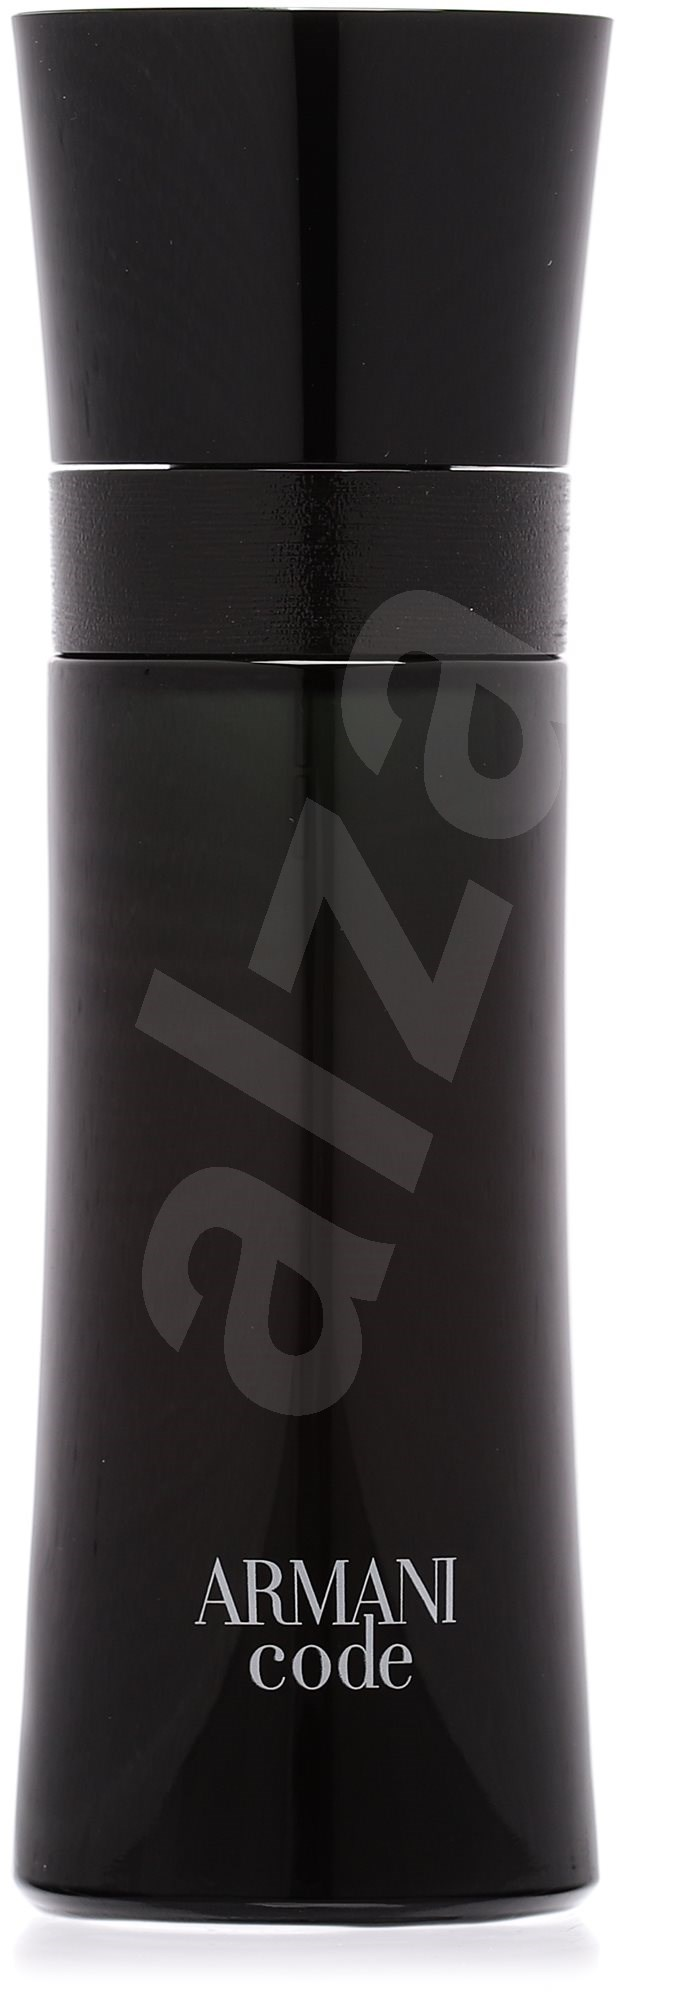 giorgio armani code homme edt 75 ml herren eau de. Black Bedroom Furniture Sets. Home Design Ideas